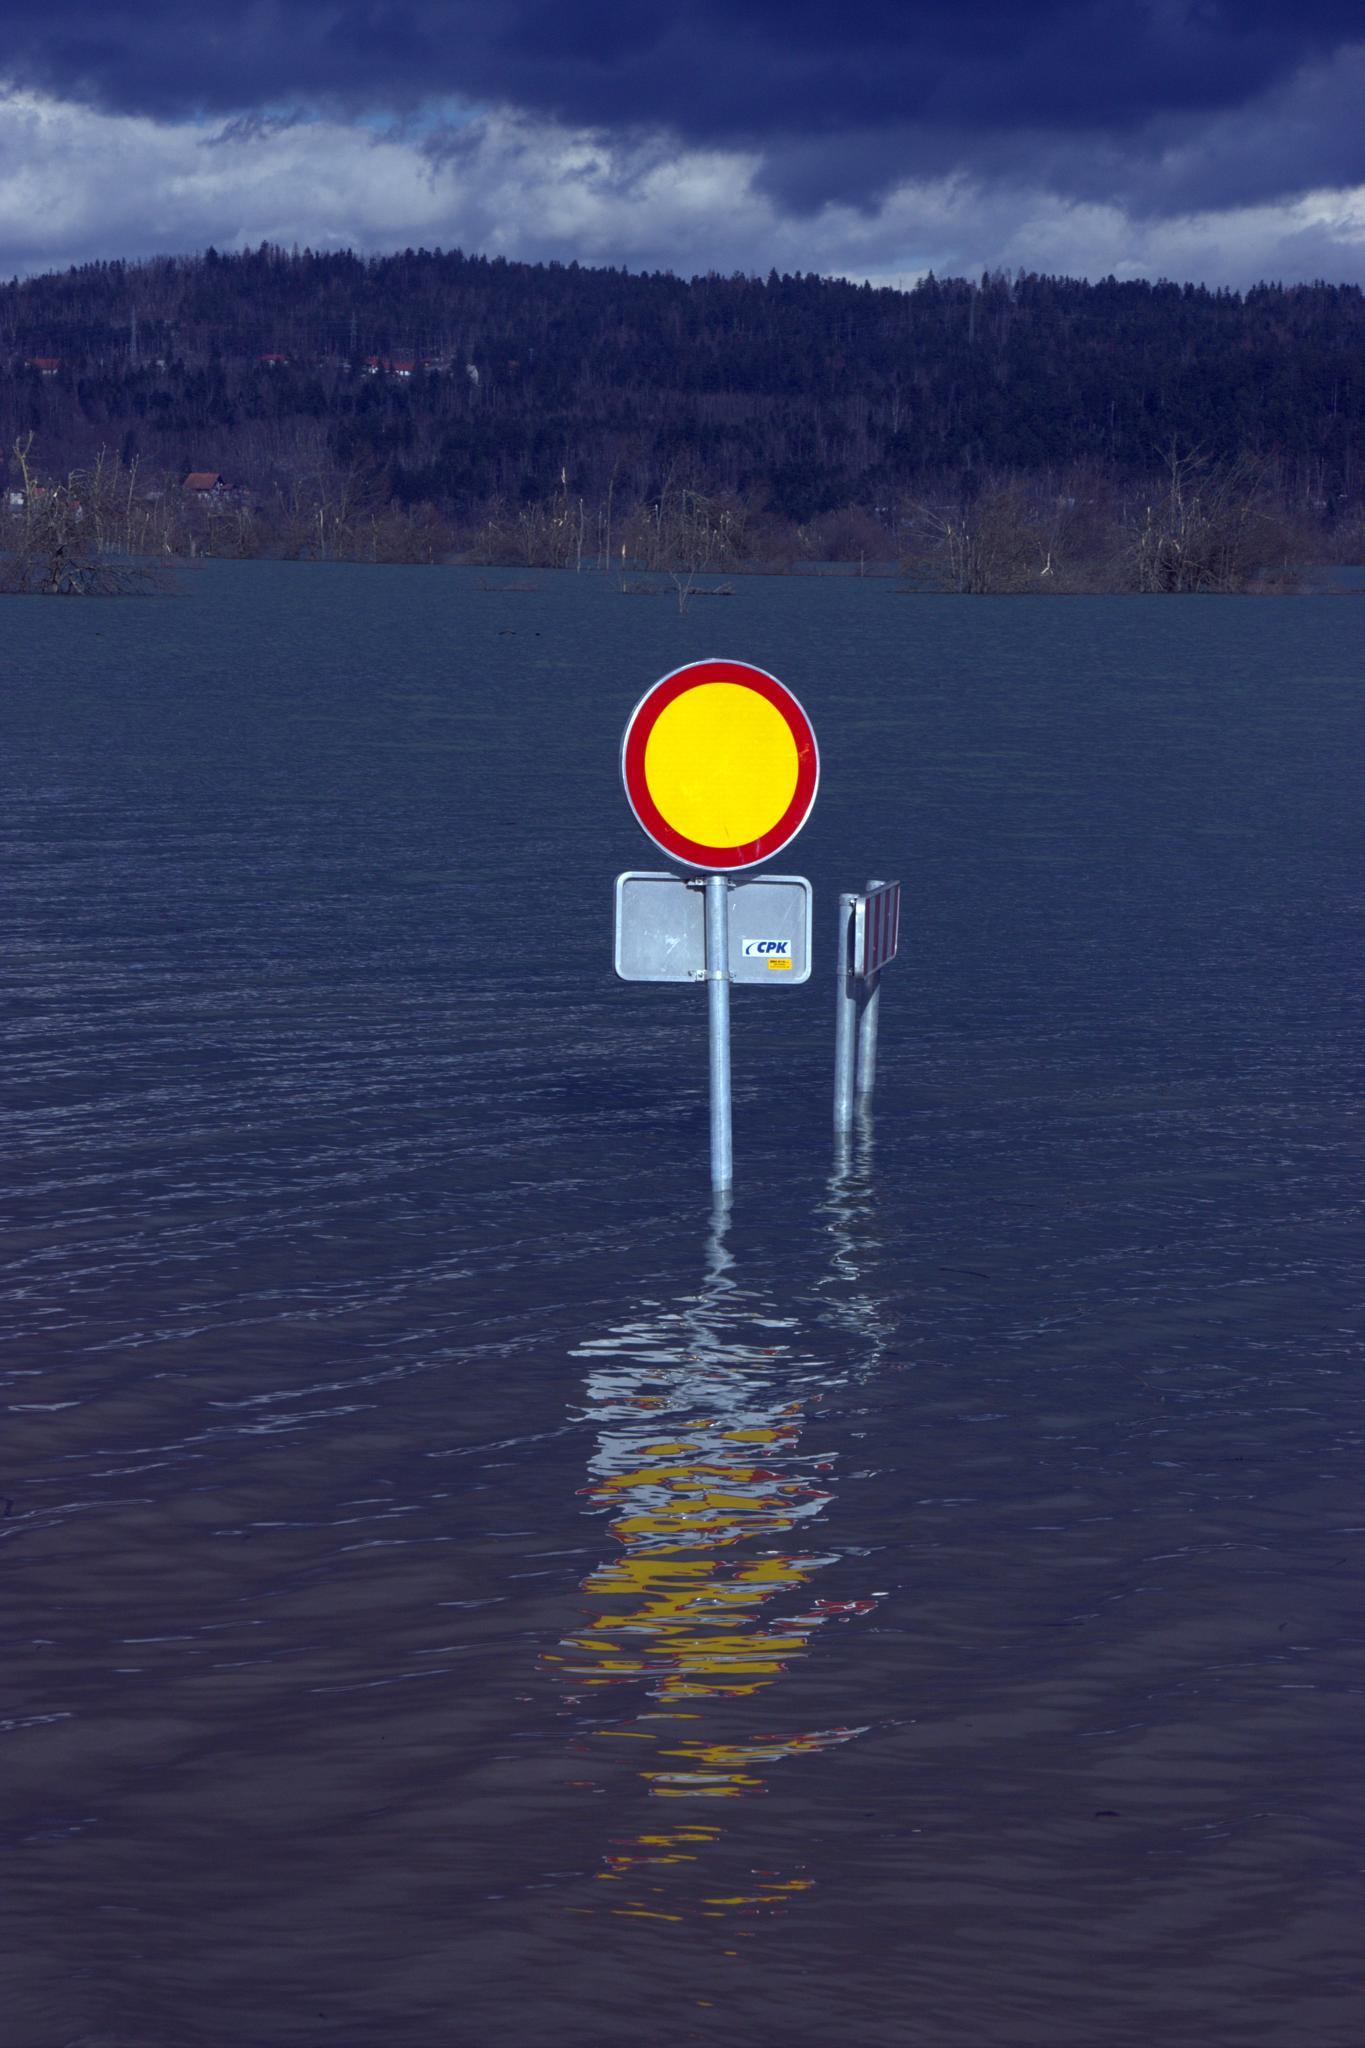 Traffic management during floods - Planinsko field by leopold.brzin